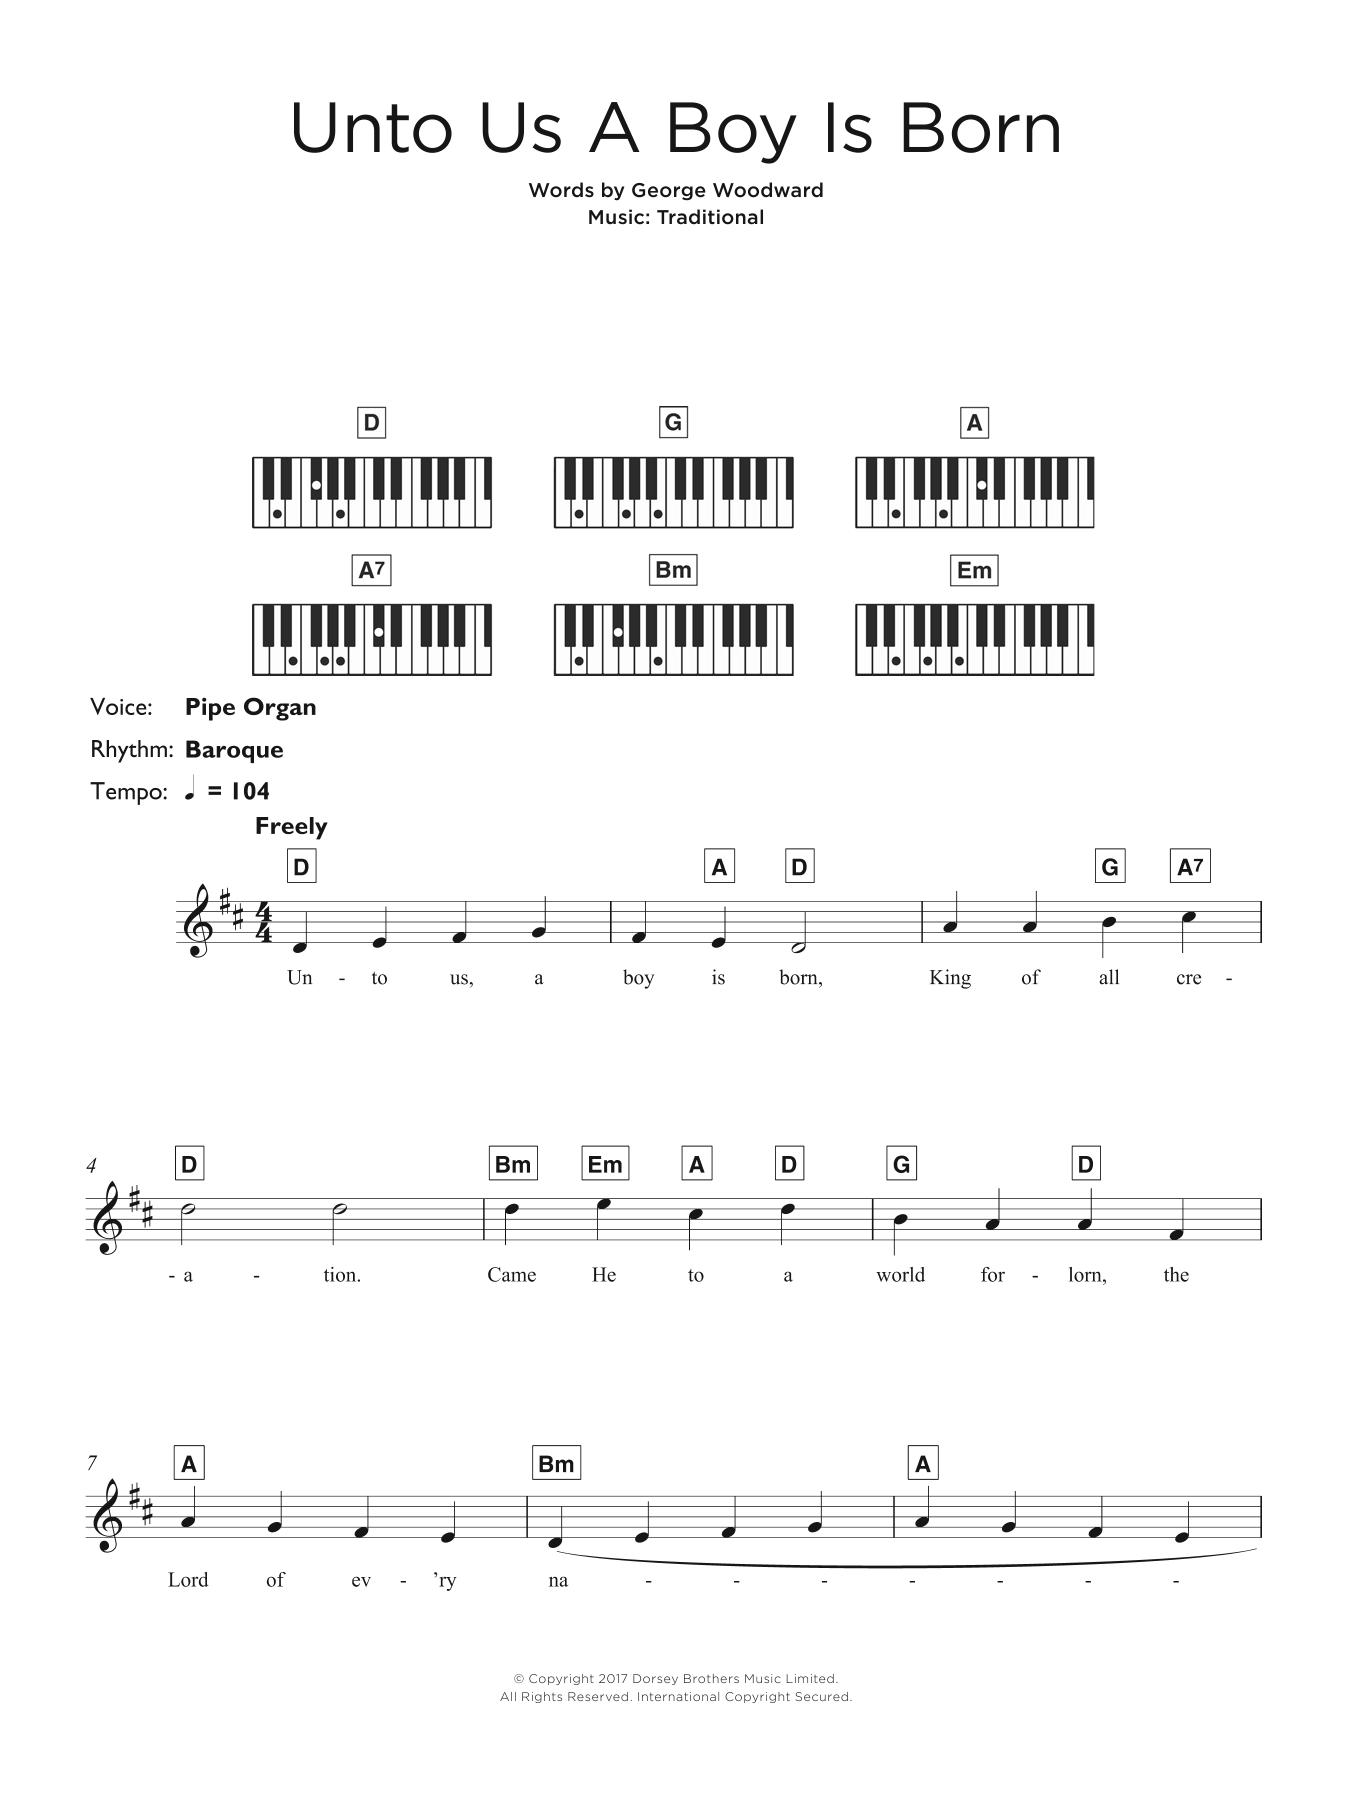 Duke Ellington In A Sentimental Mood At Stantons Sheet Music